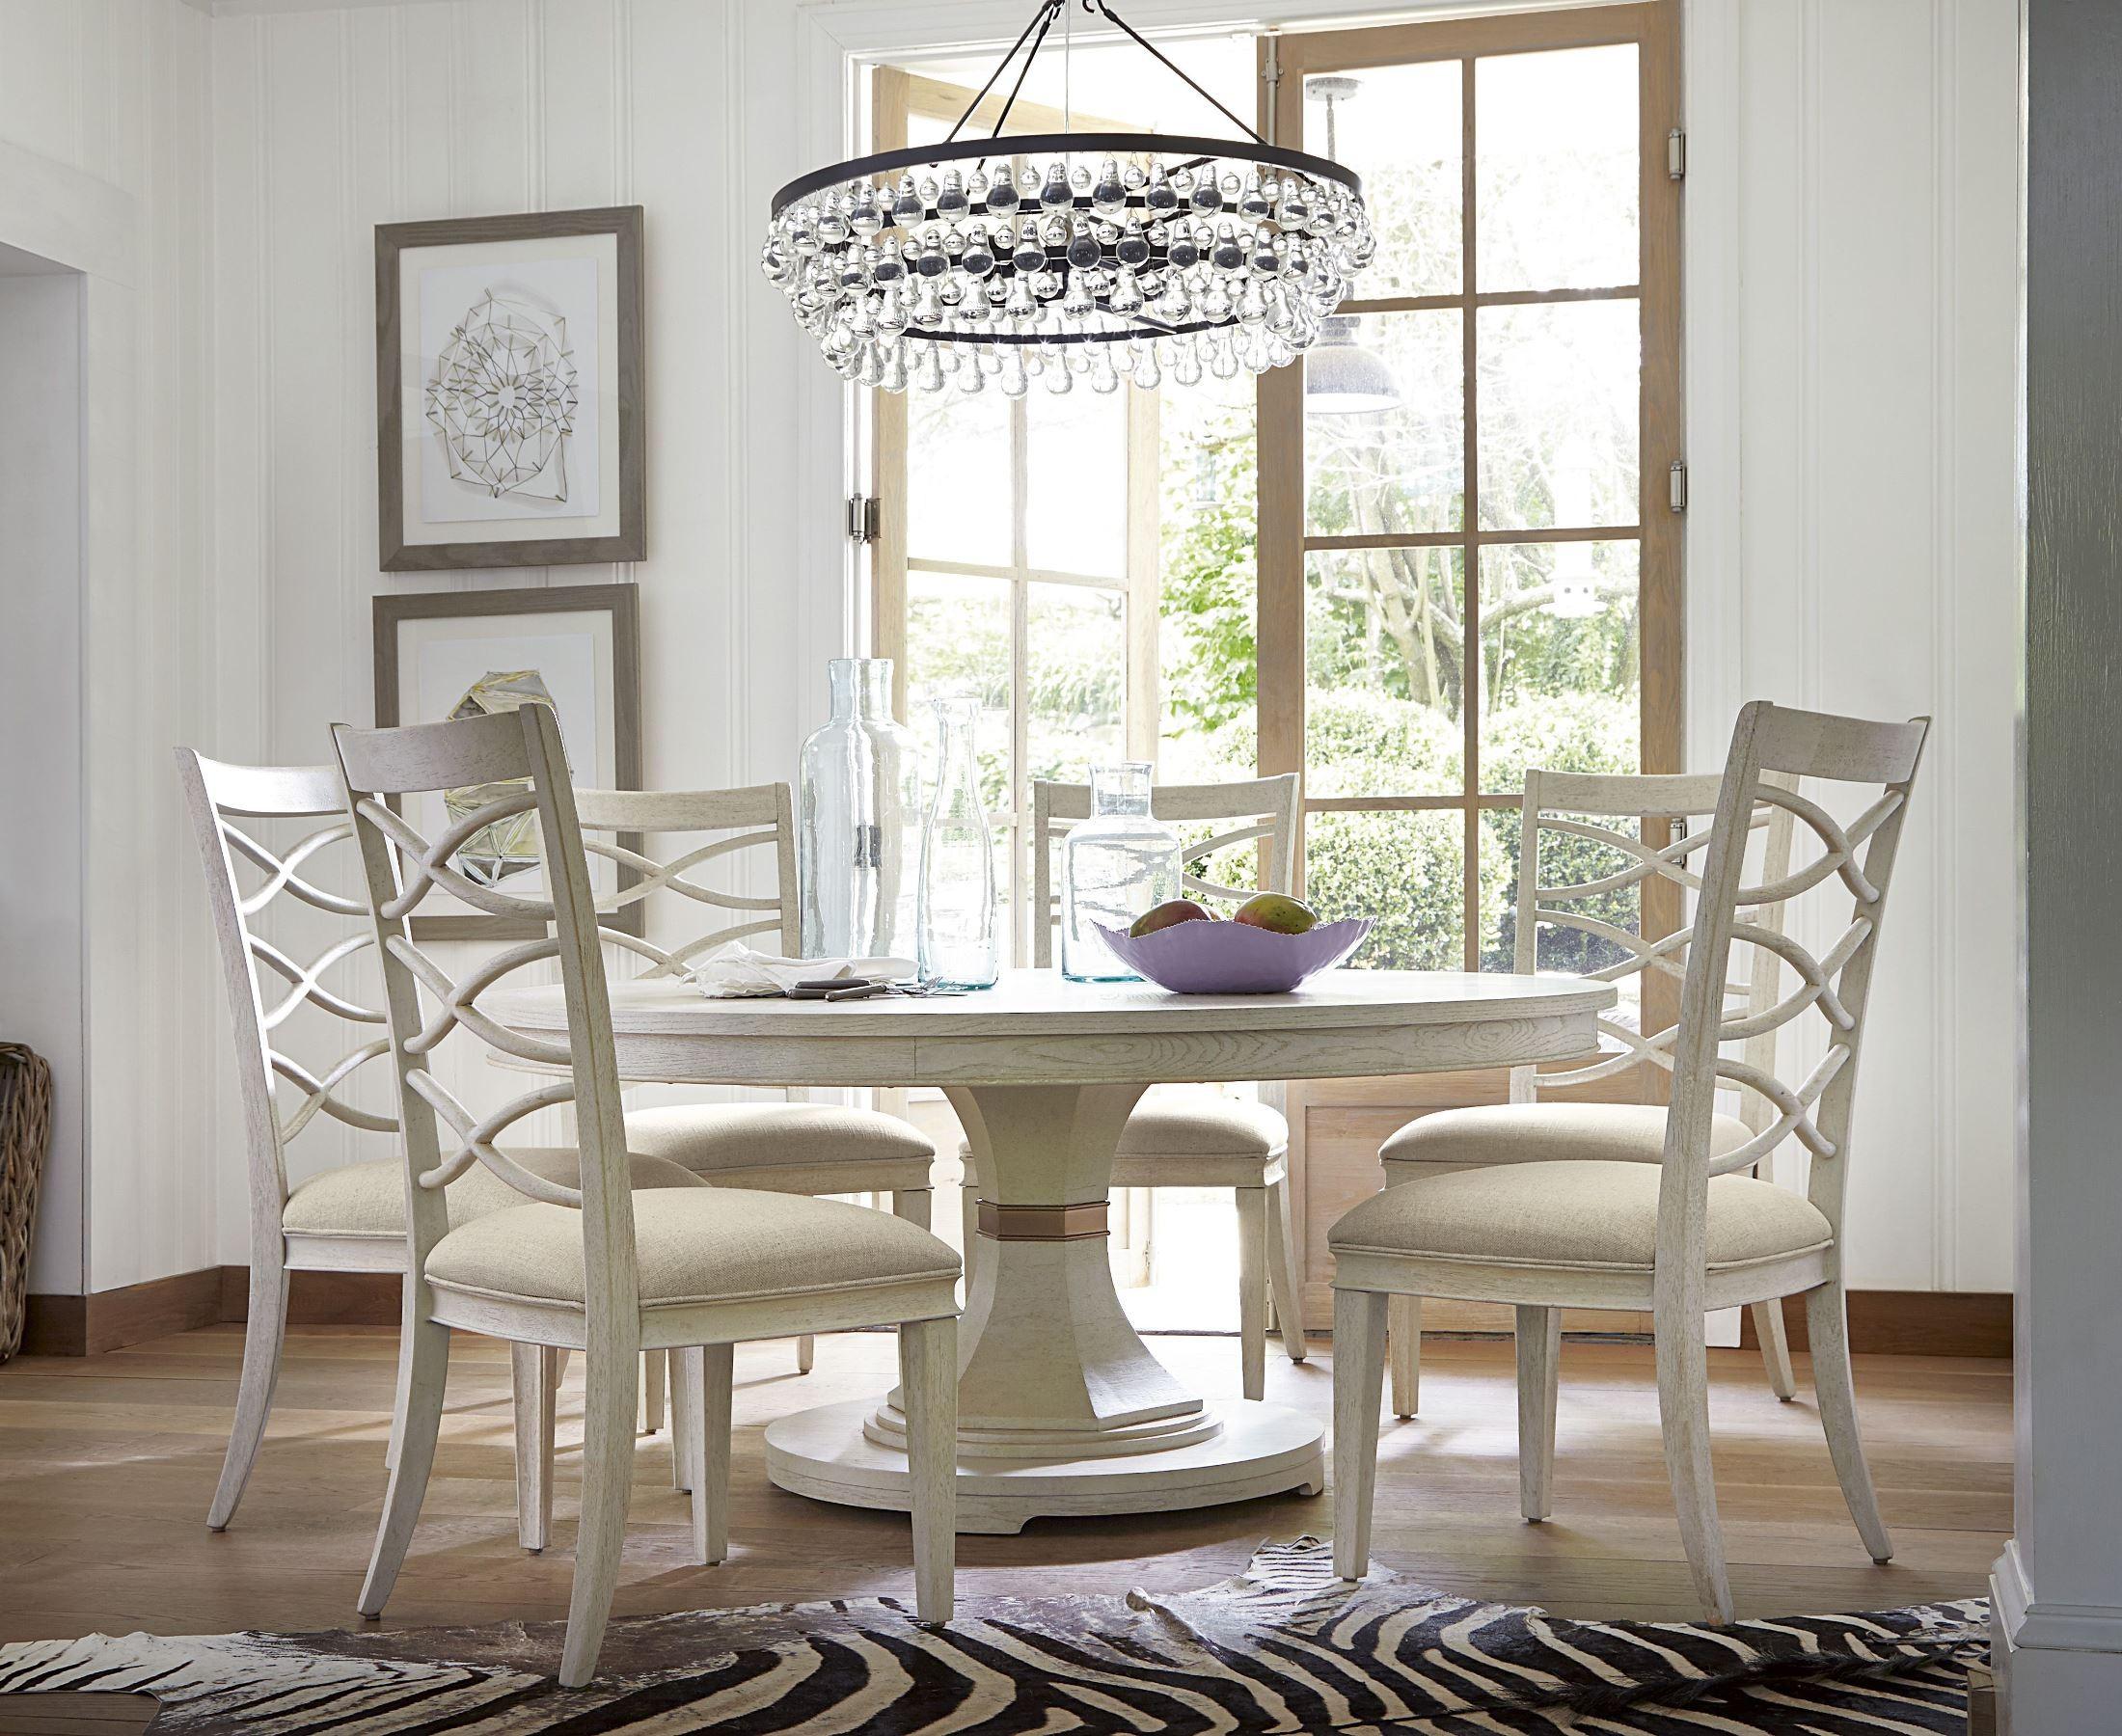 California Malibu Round Dining Room Set From Universal